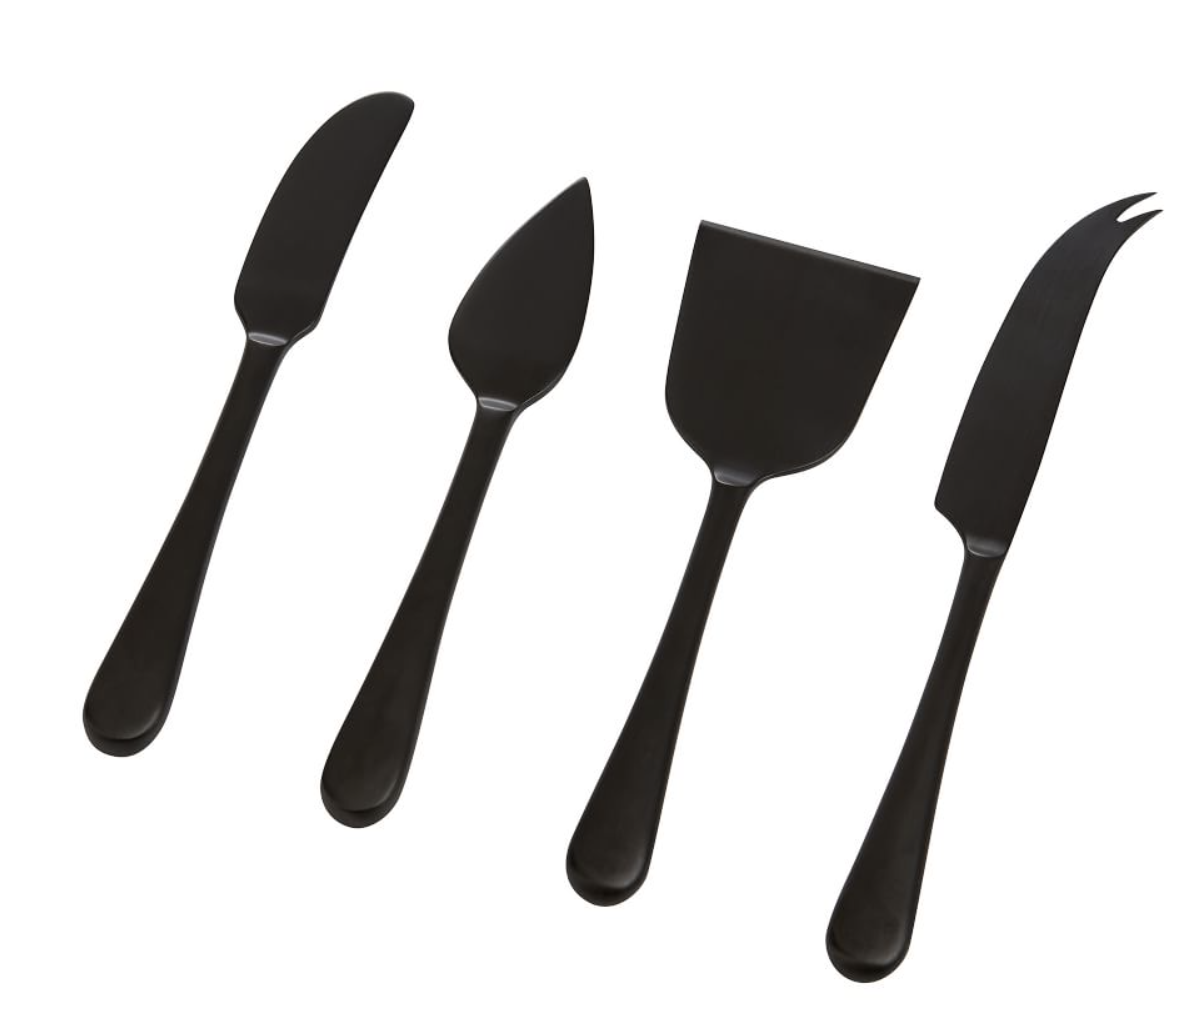 Mason Cheese Knives in Black